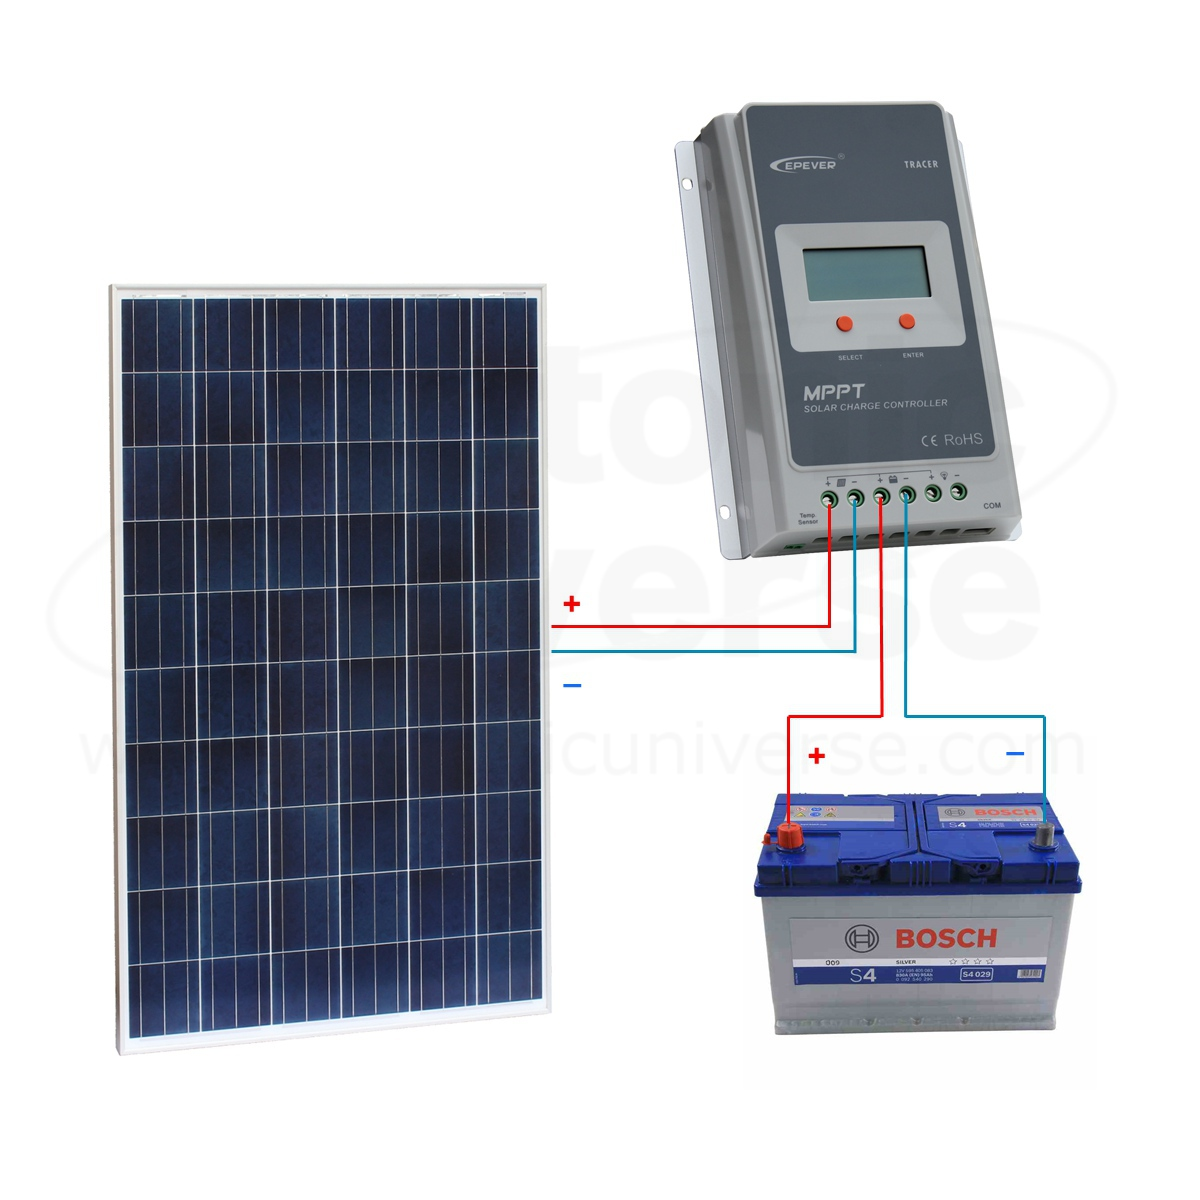 caravan solar wiring diagram diagrams for system smartproxyfo hotpoint dryer timer 12v panels charging kits caravans motorhomes